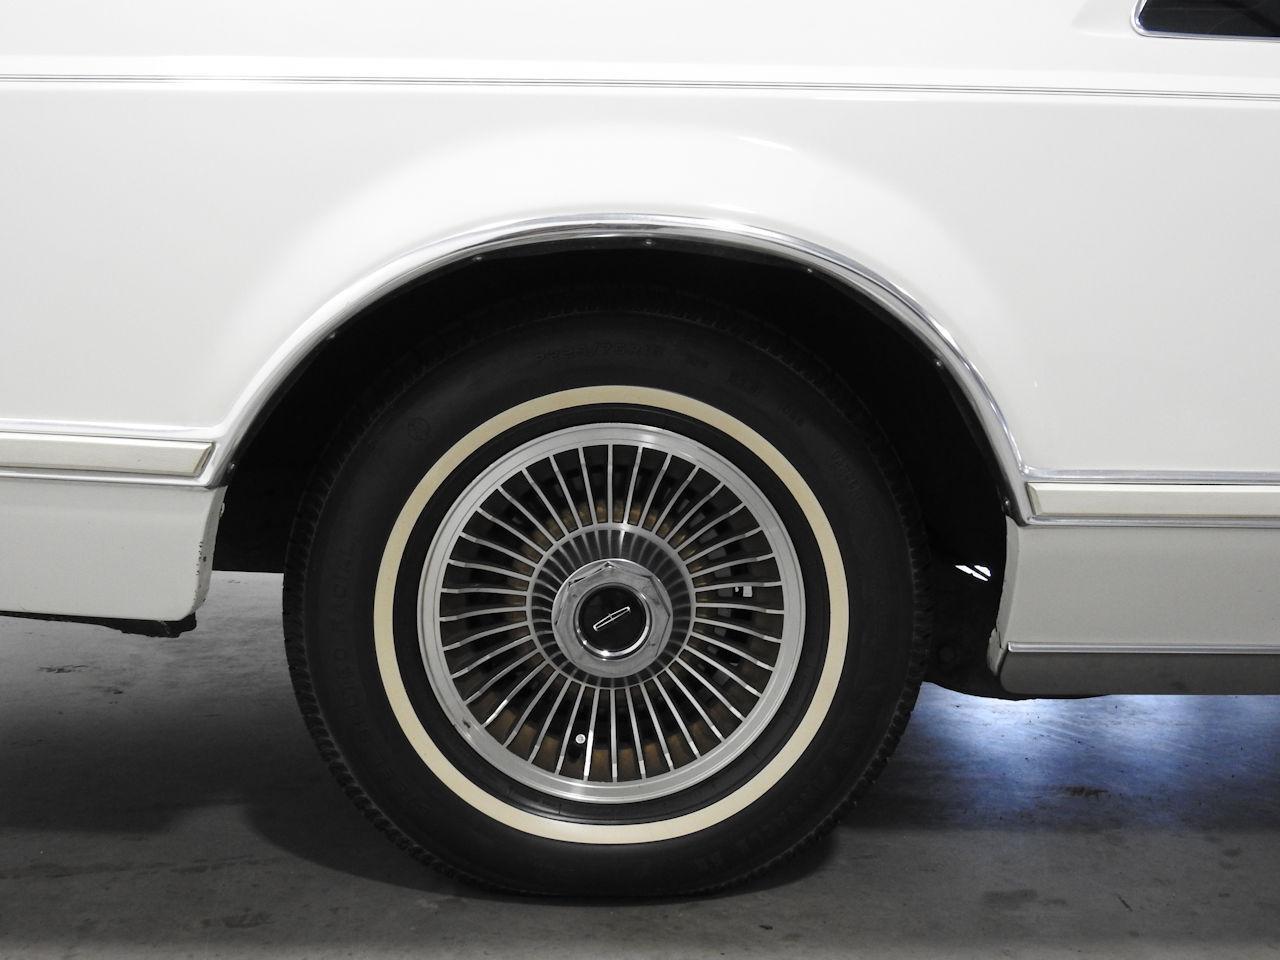 1979 Lincoln MKV 89